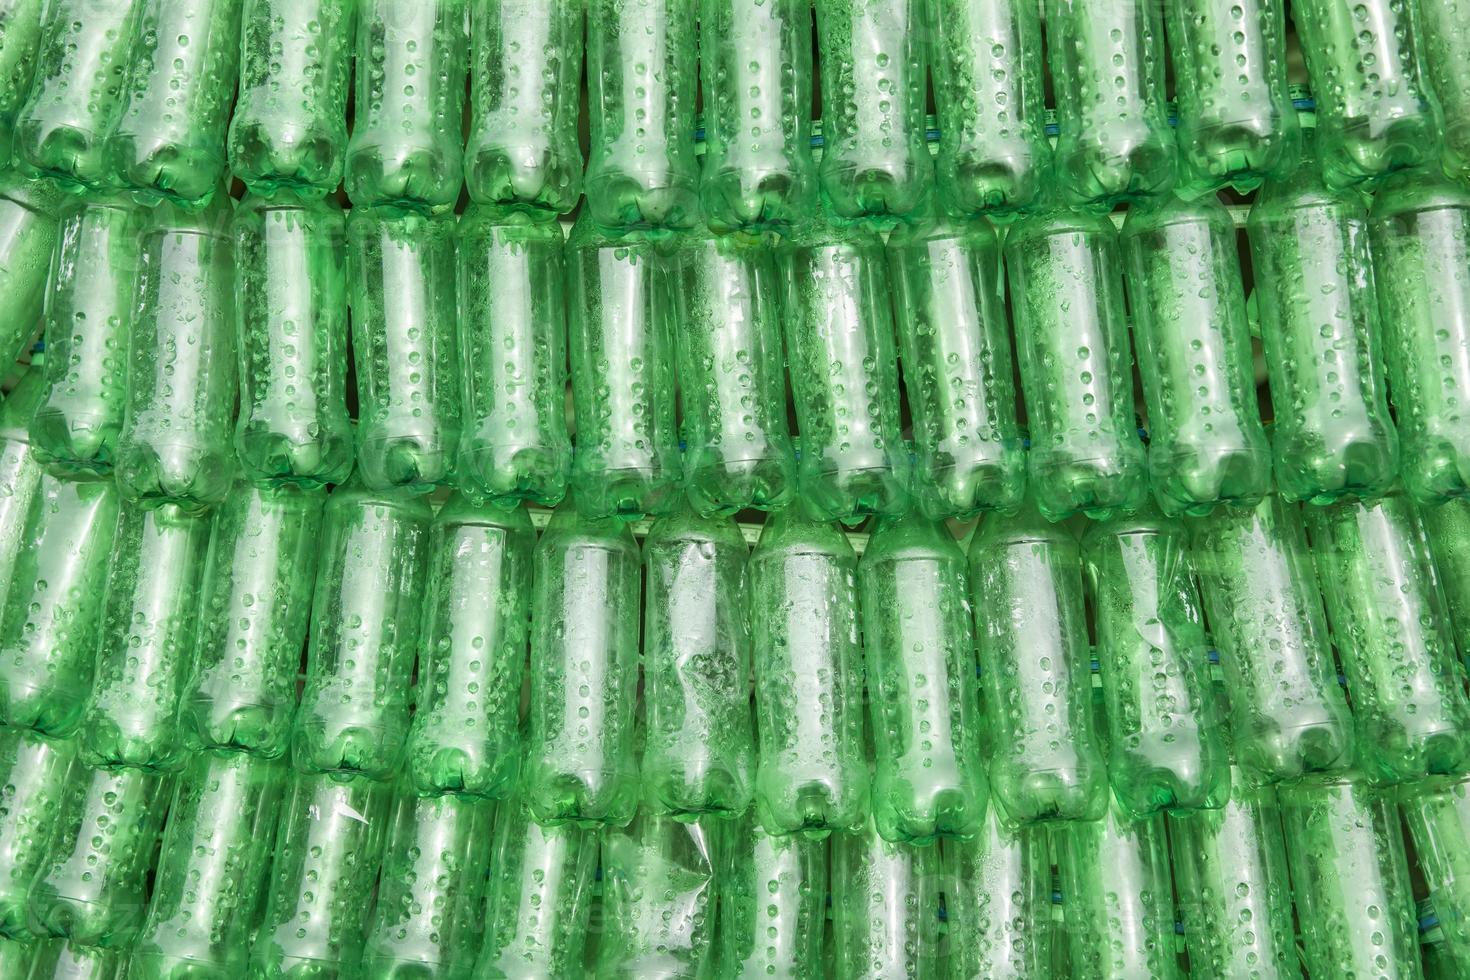 rijen groene plastic flessen naast elkaar gestapeld foto